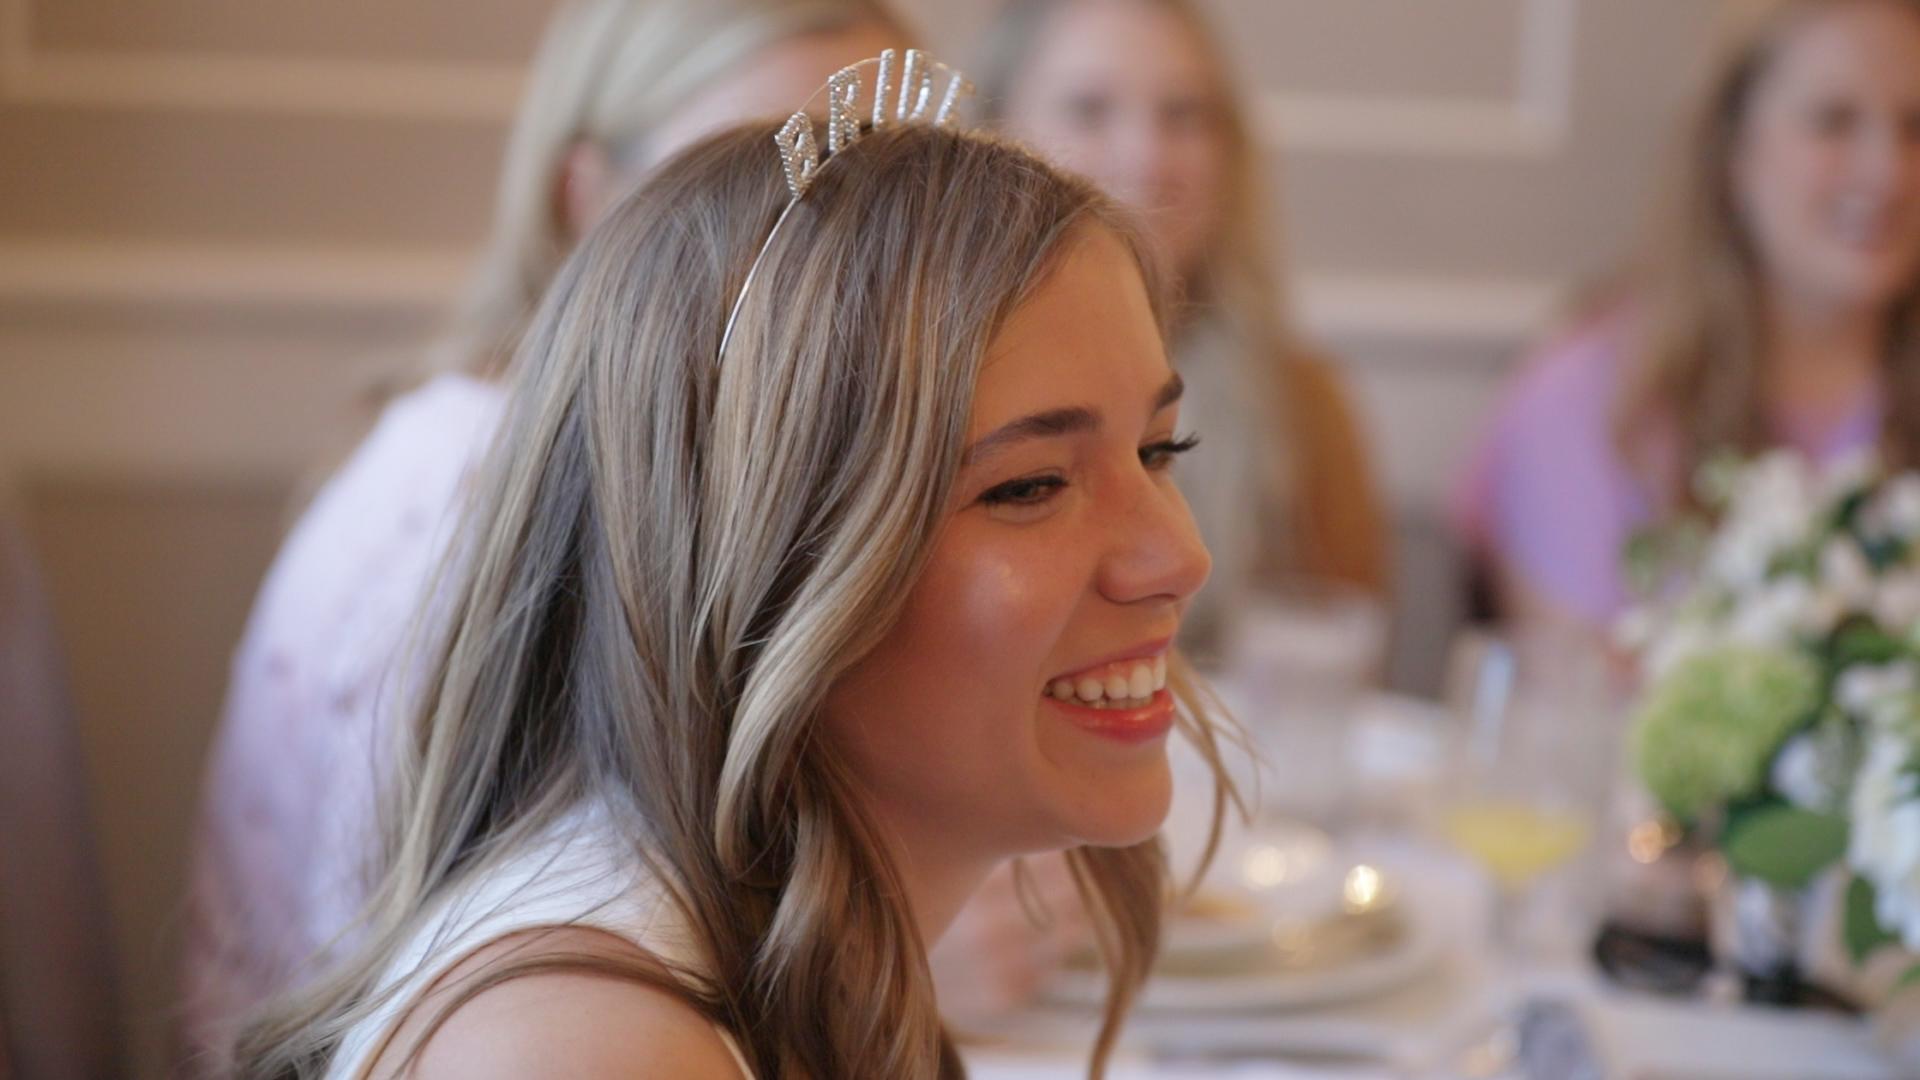 Commanders Palace Wedding Video - Bride Film - Bridal Luncheon